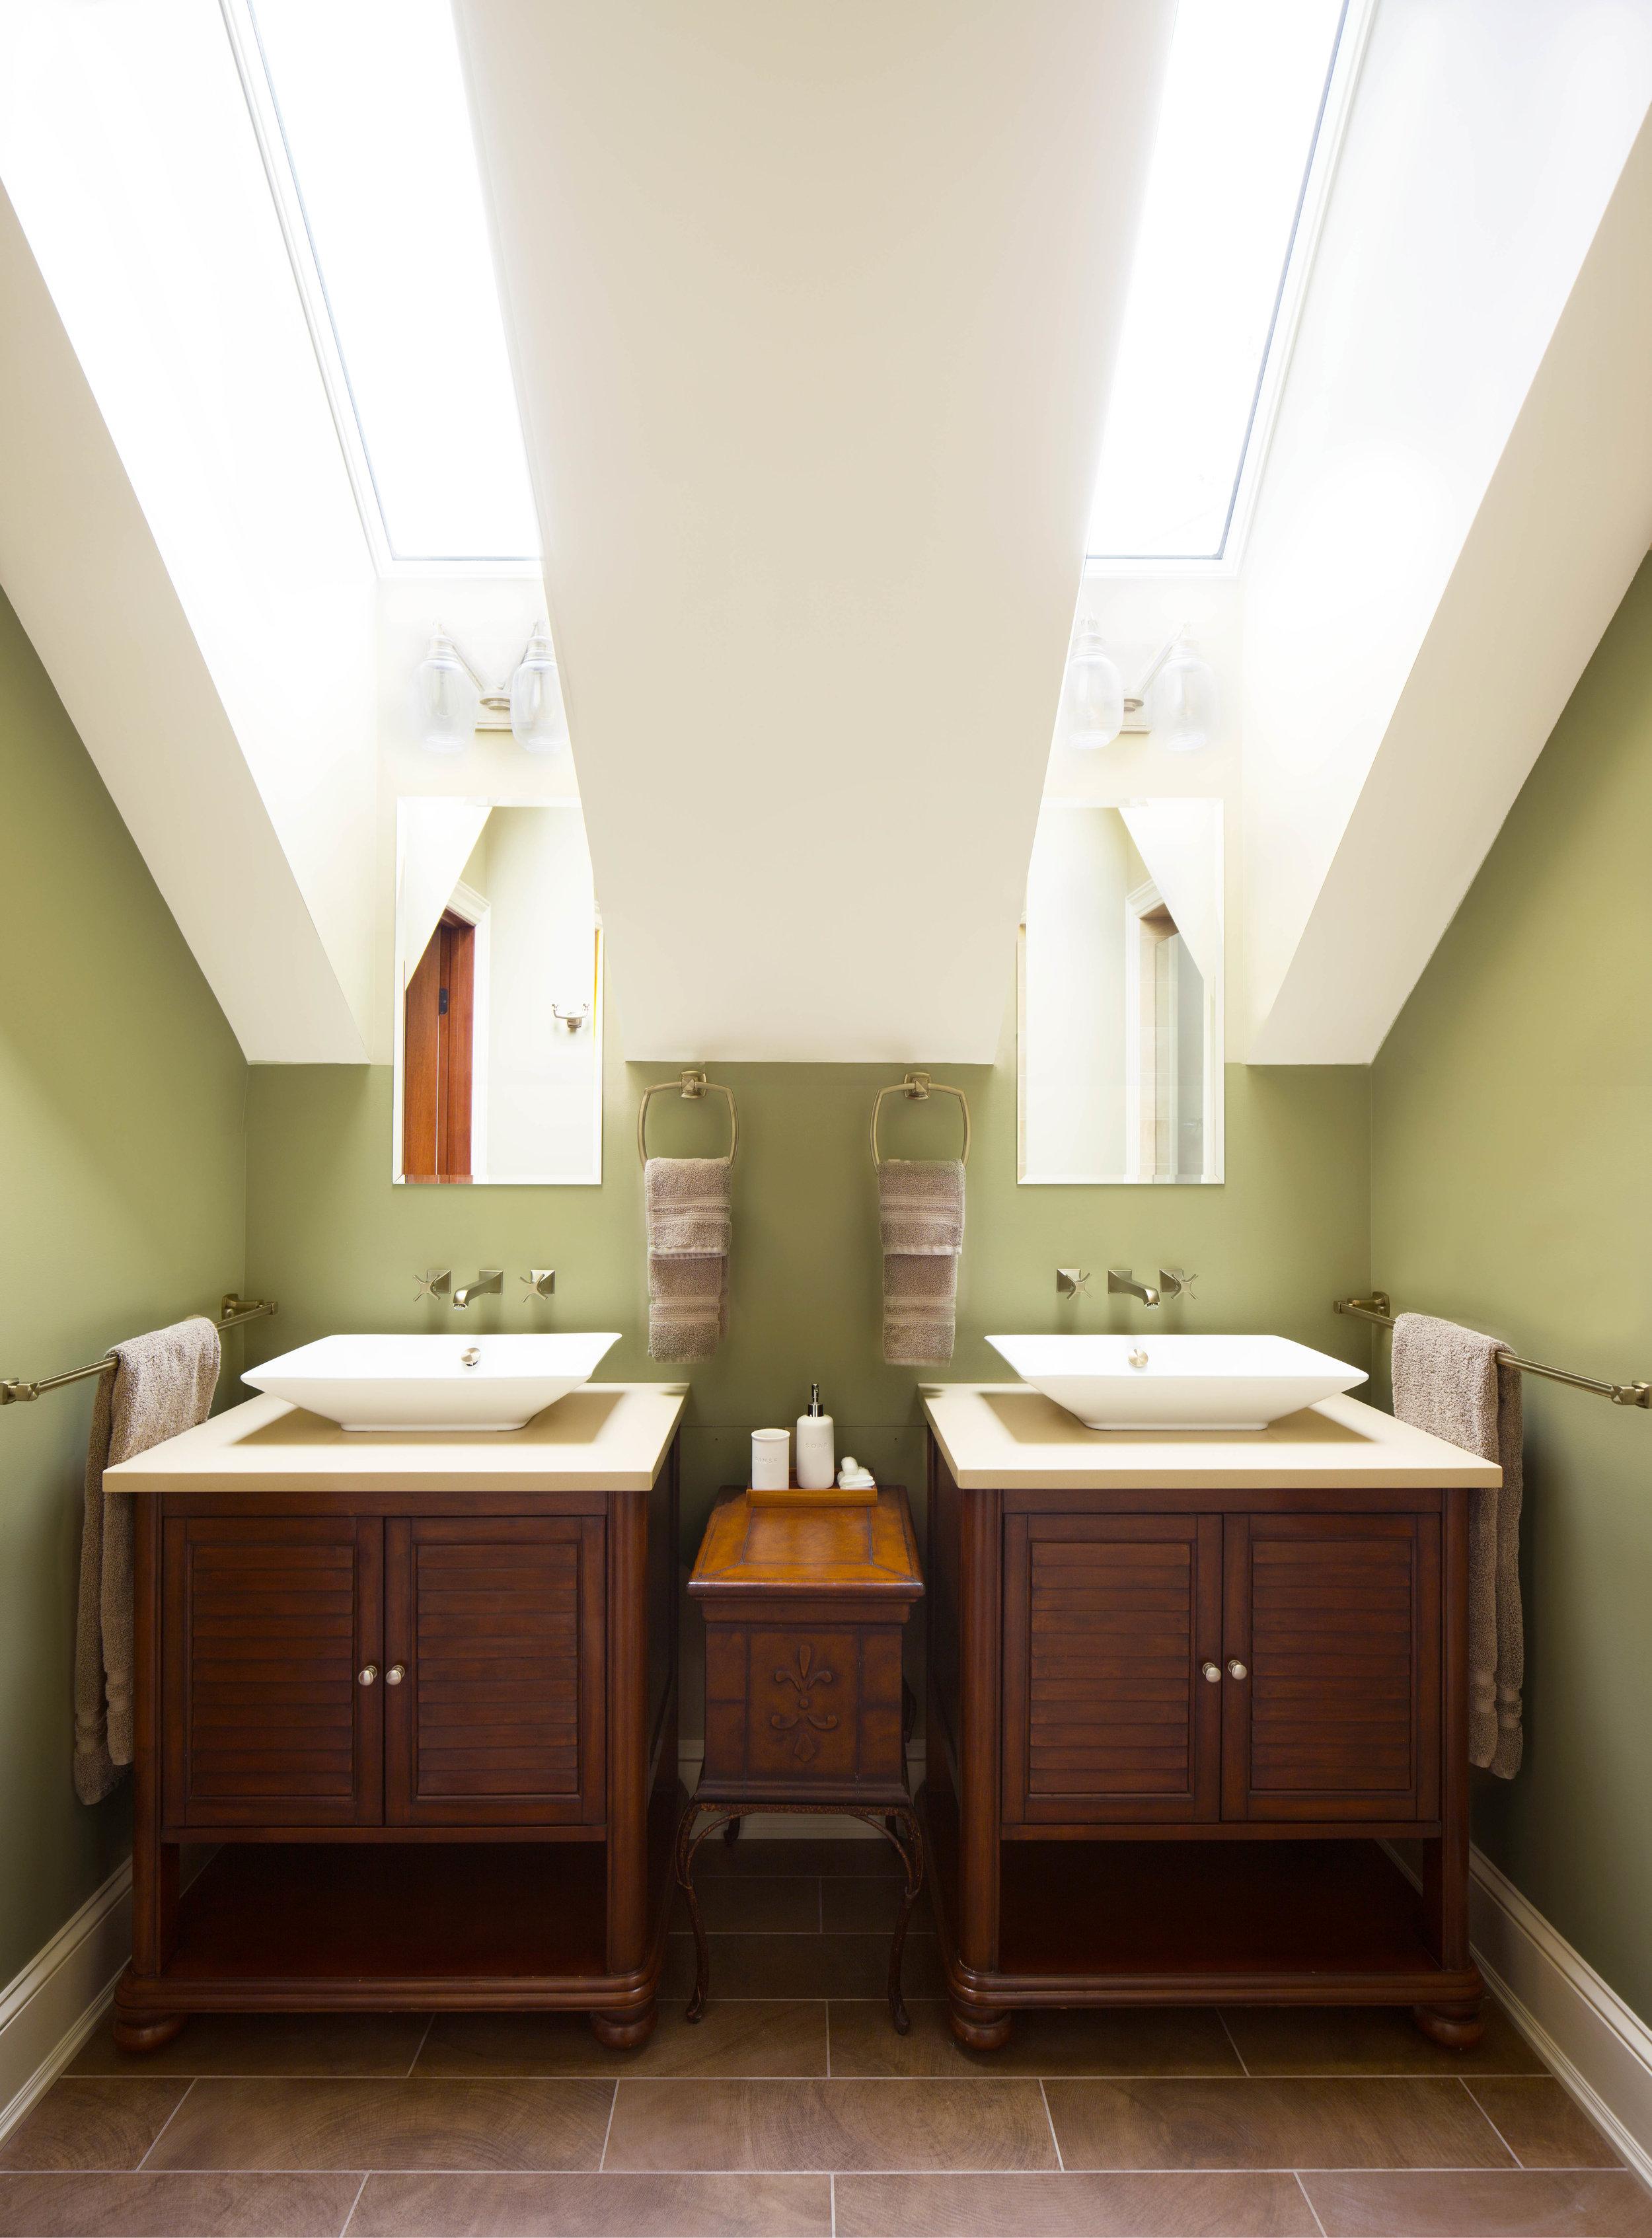 Corcoran-2556 Guest Bathroom.jpg